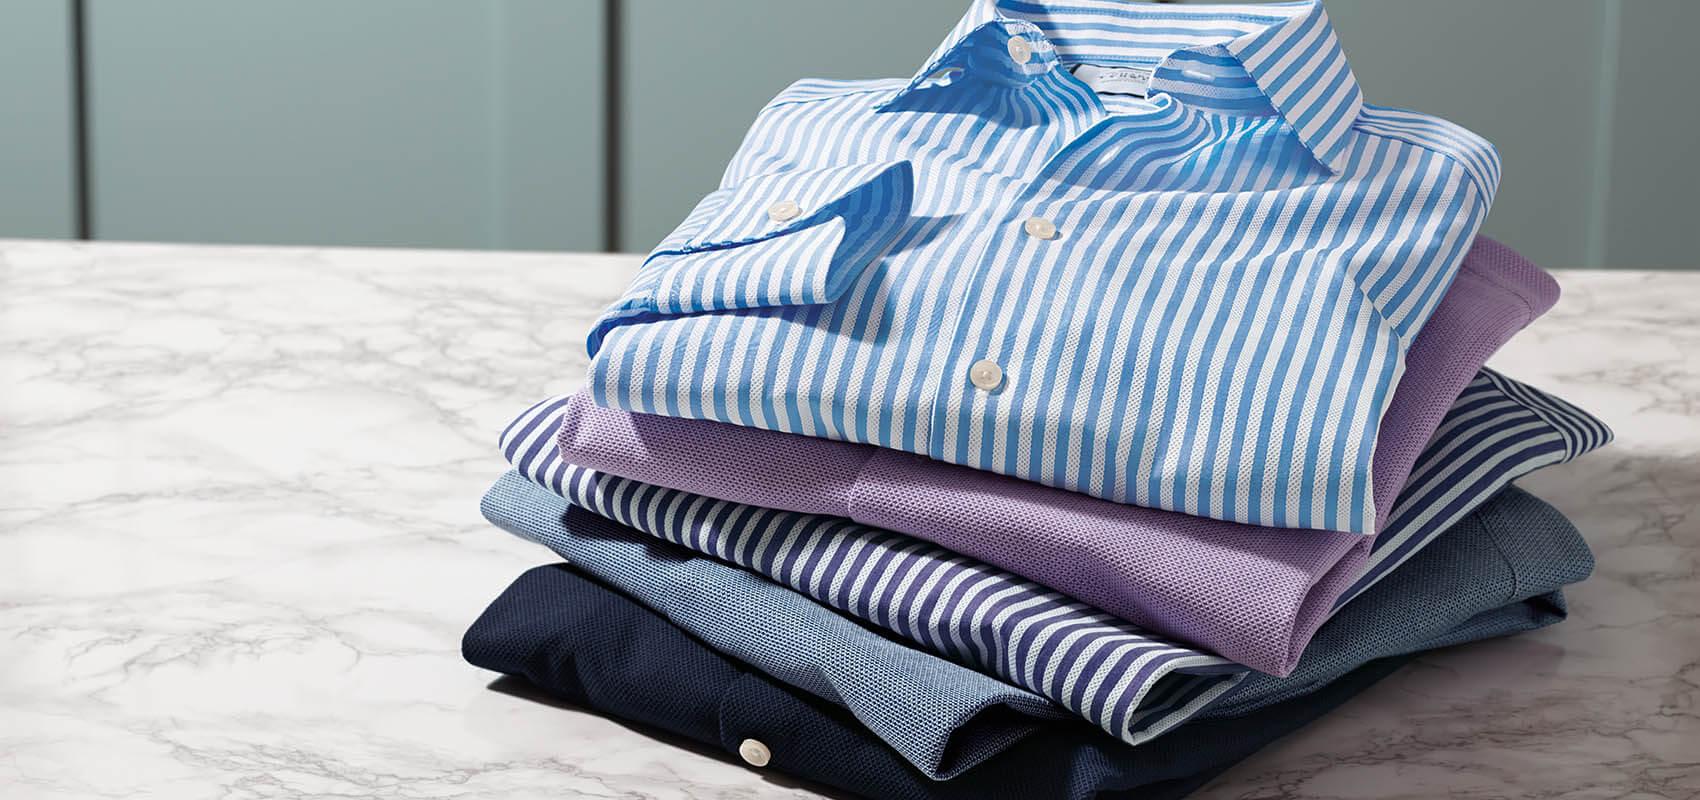 Charles Tyrwhitt Leno Weave Shirts